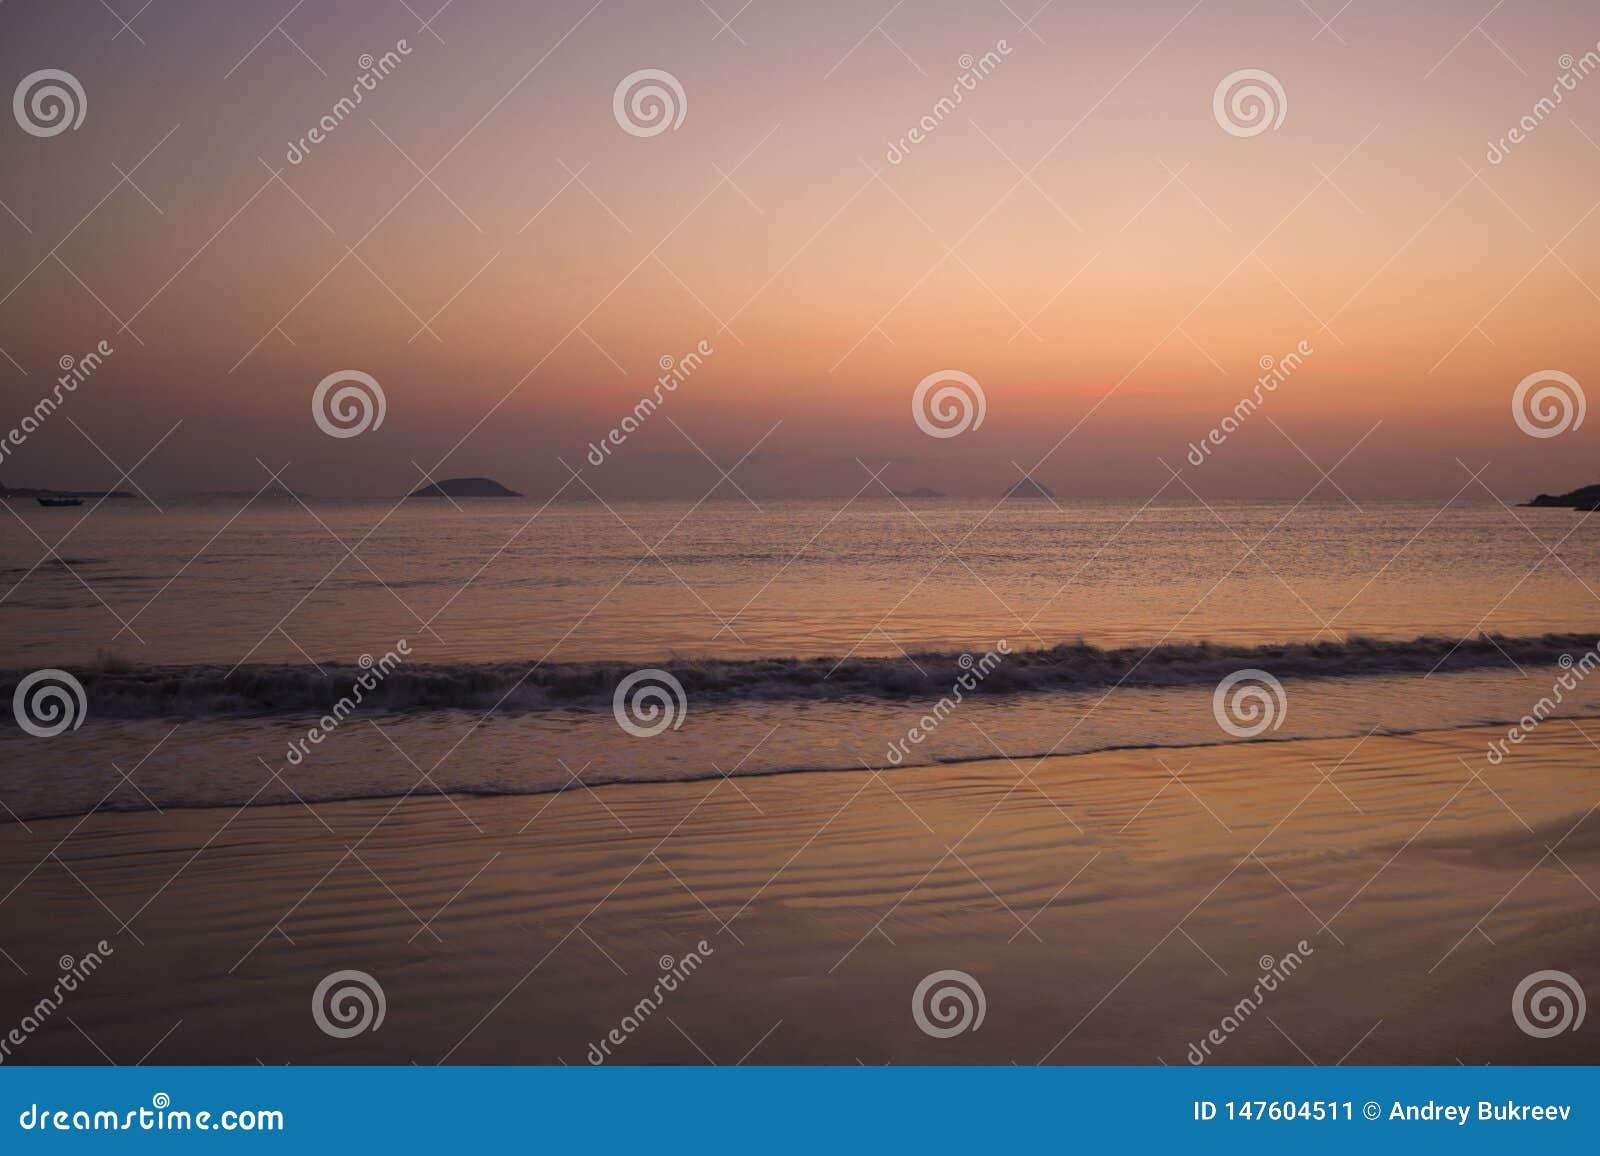 Overzees strand bij zonsopgang en zonsondergang